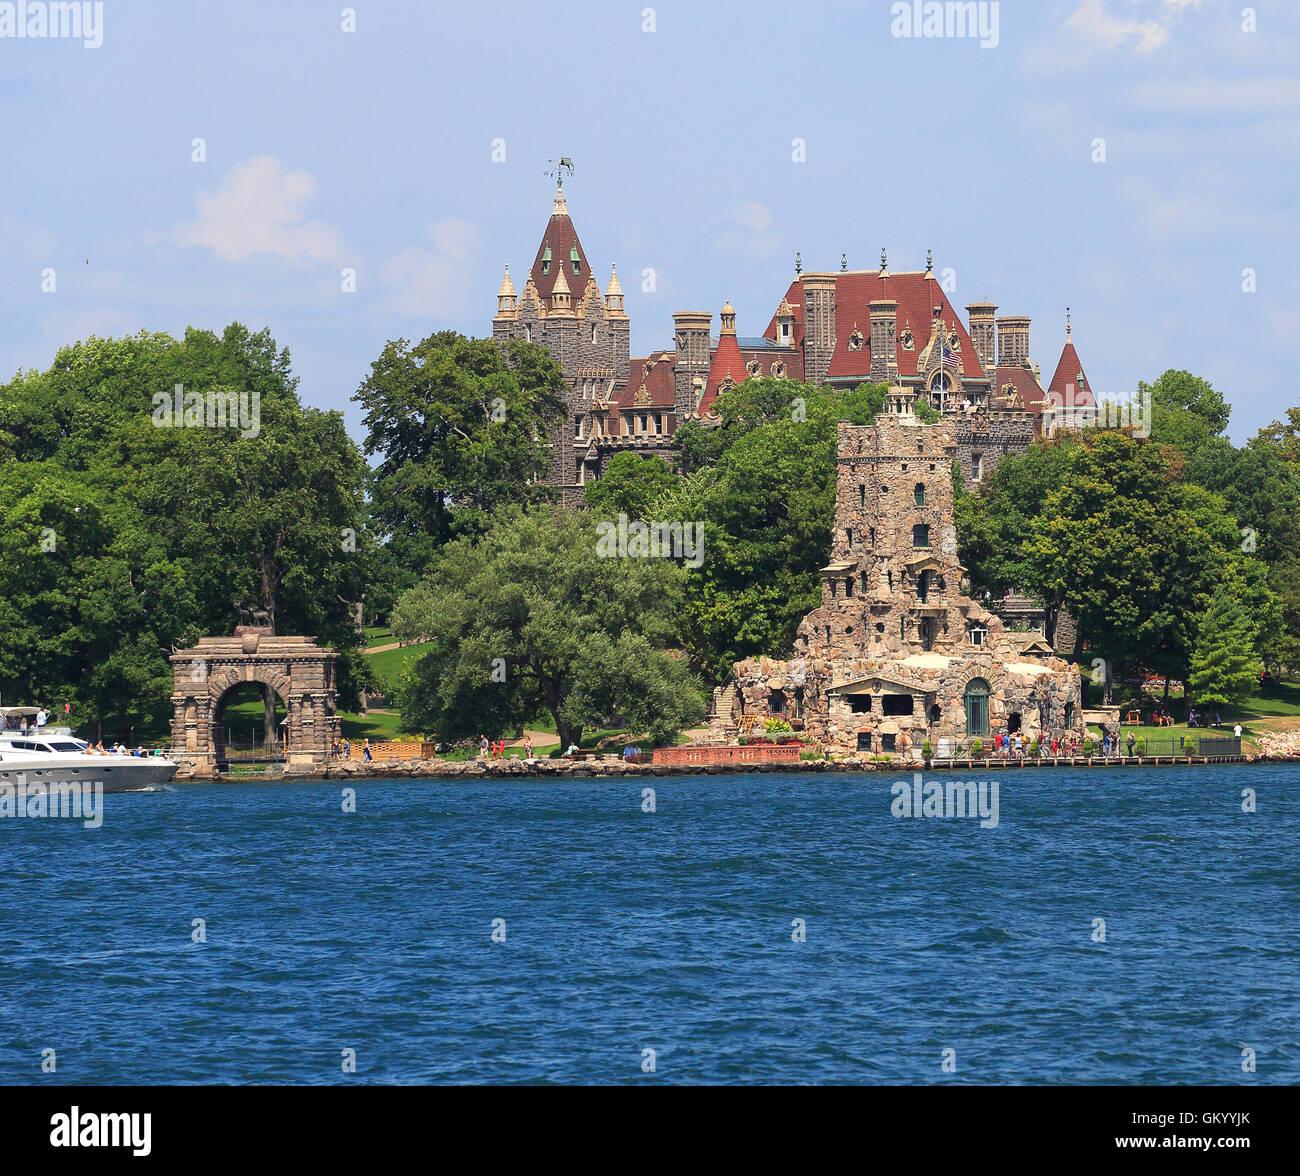 Boldt Castle in Heart Island, Thousand Islands - Stock Image